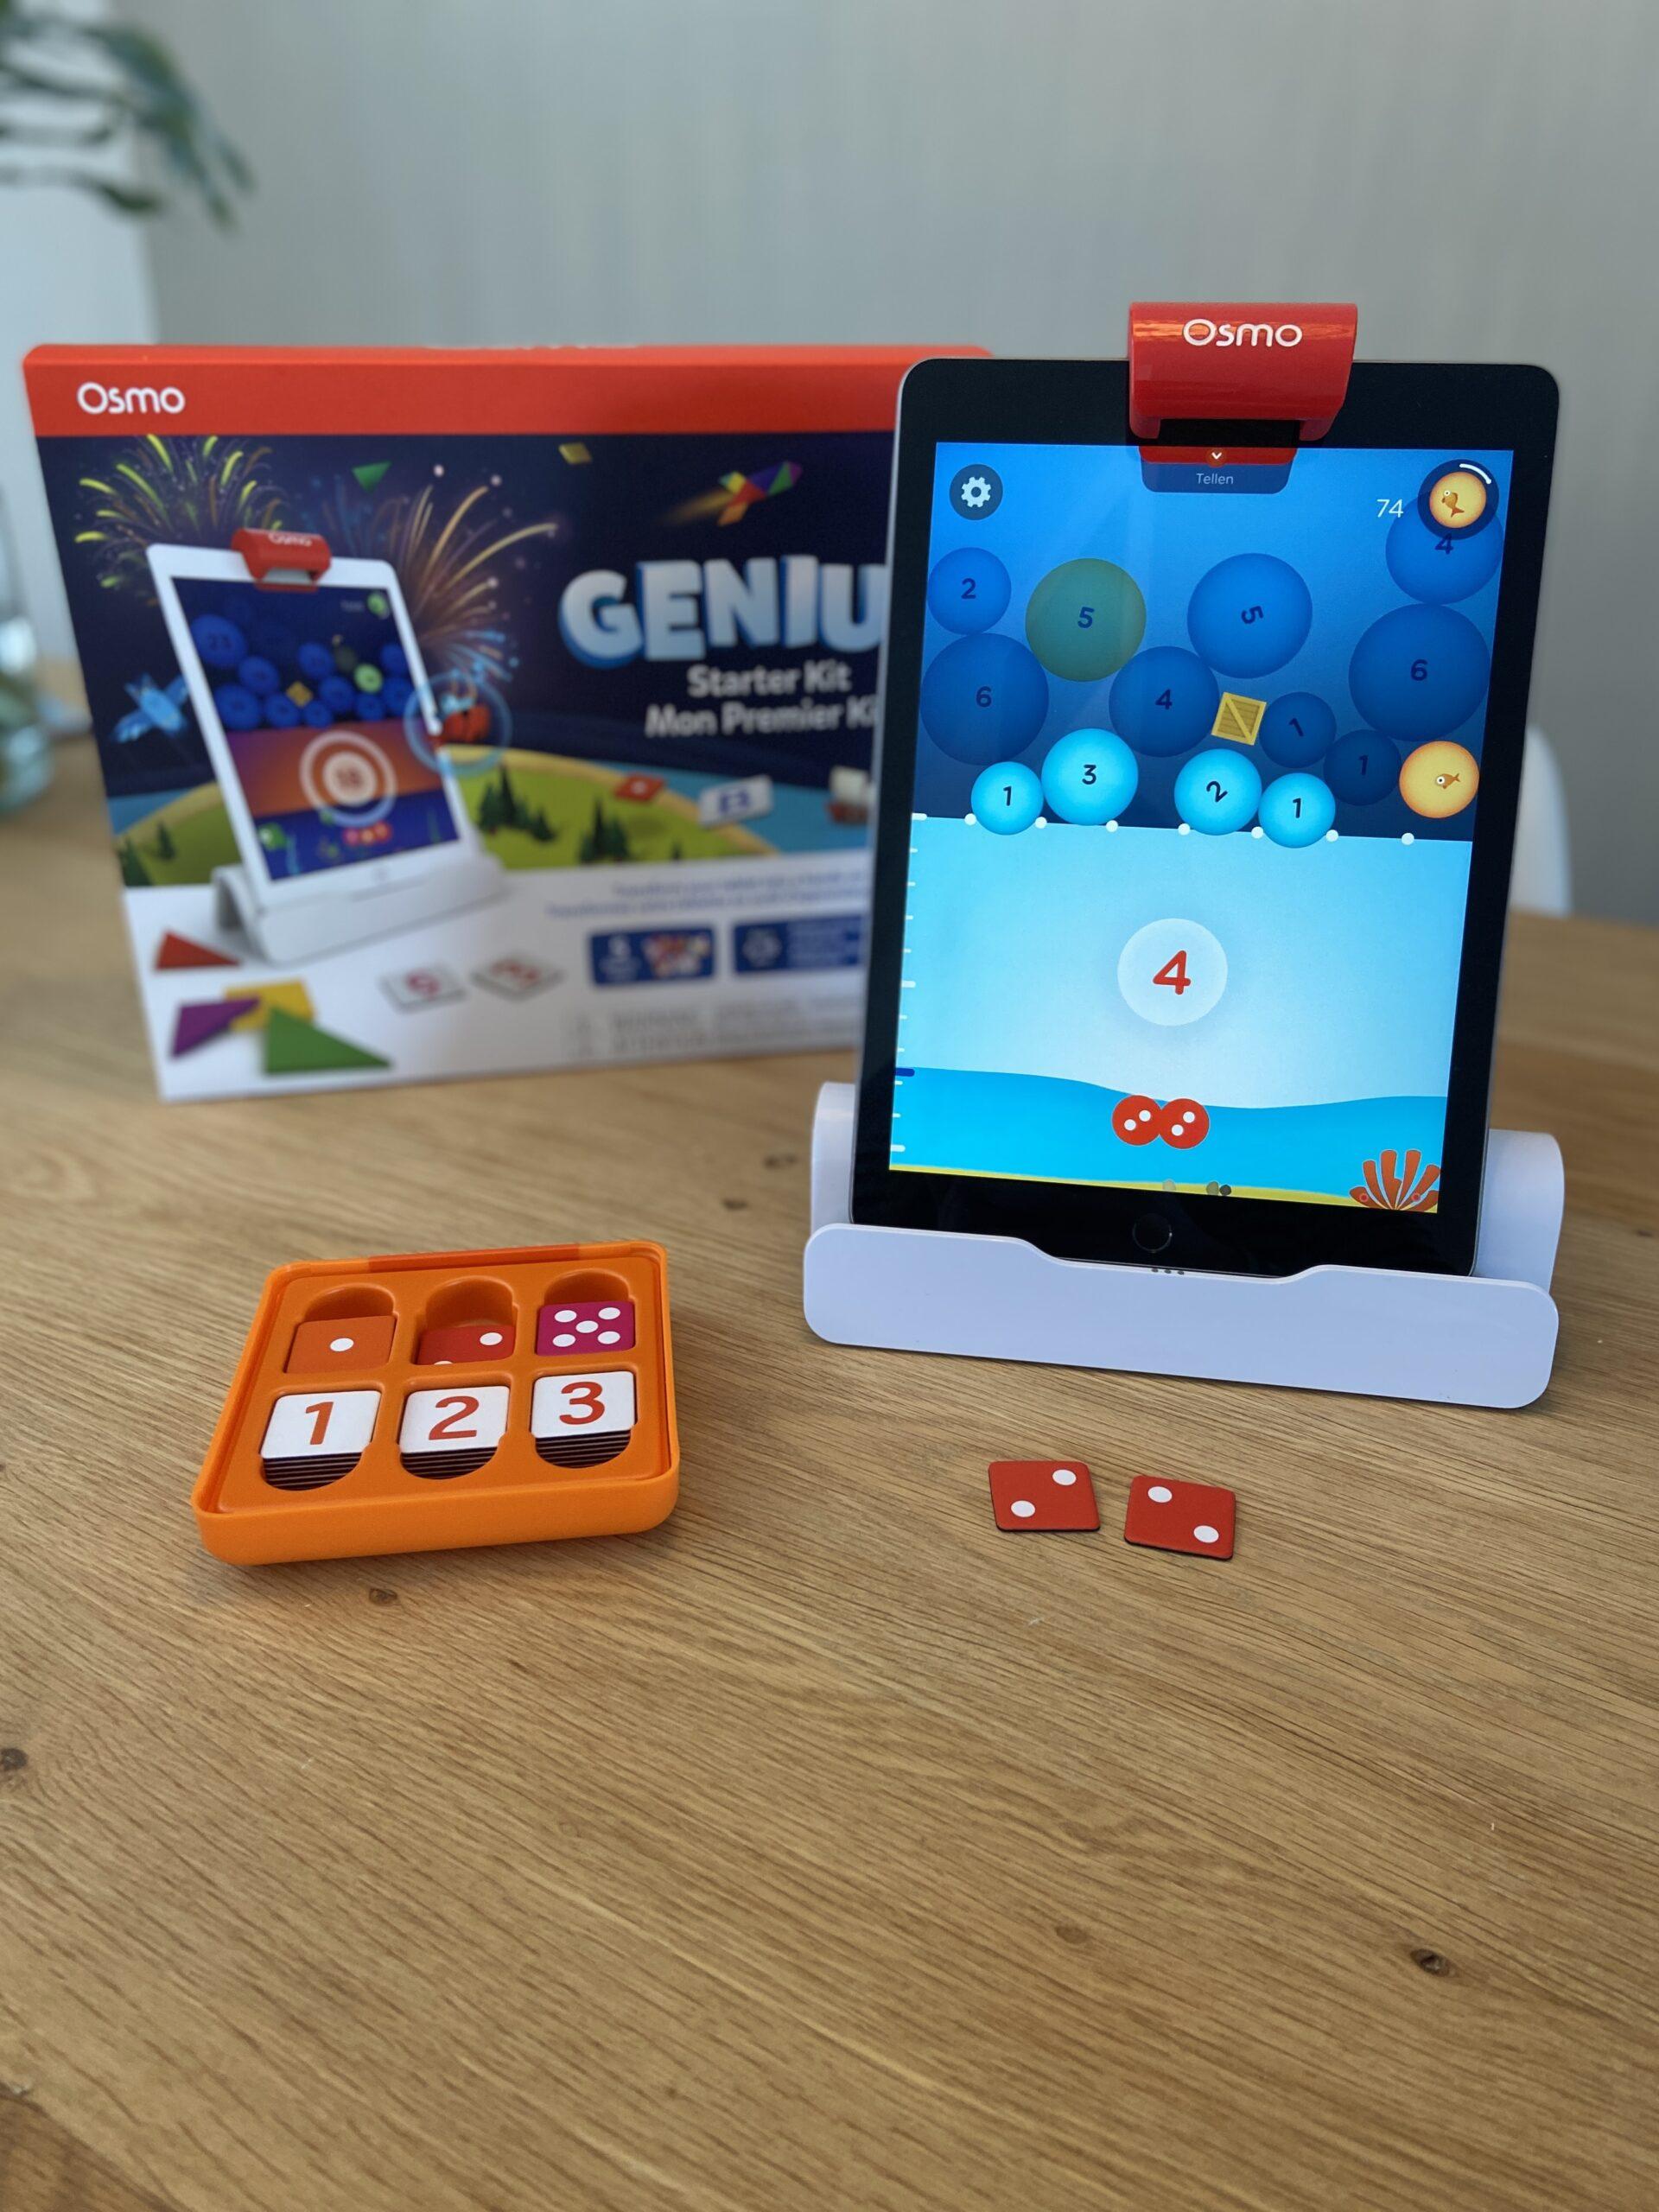 Osmo Genius Starter Kit